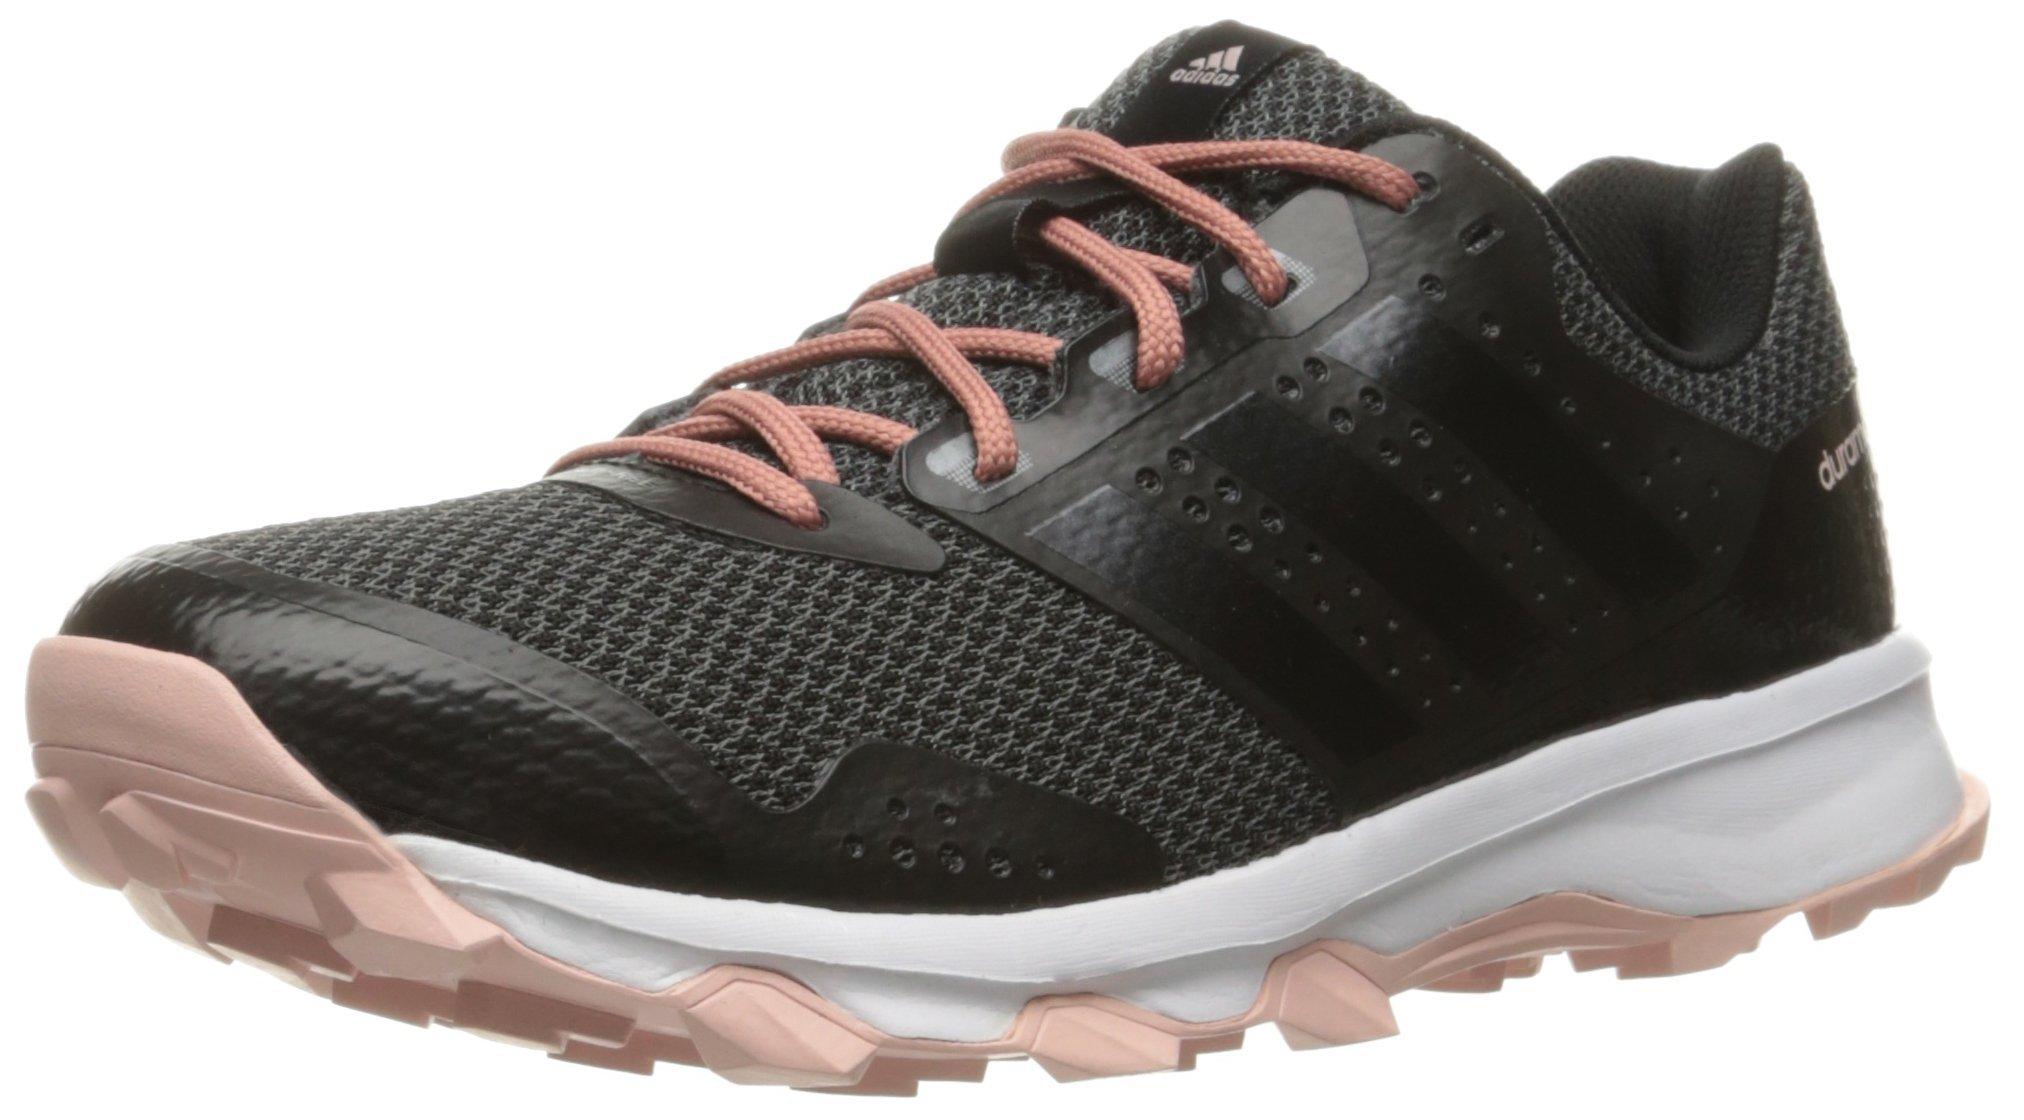 adidas Women's Duramo 7 Trail W Running Shoe, Utility Black F16/Black/Vapor Pink F16, 6.5 M US